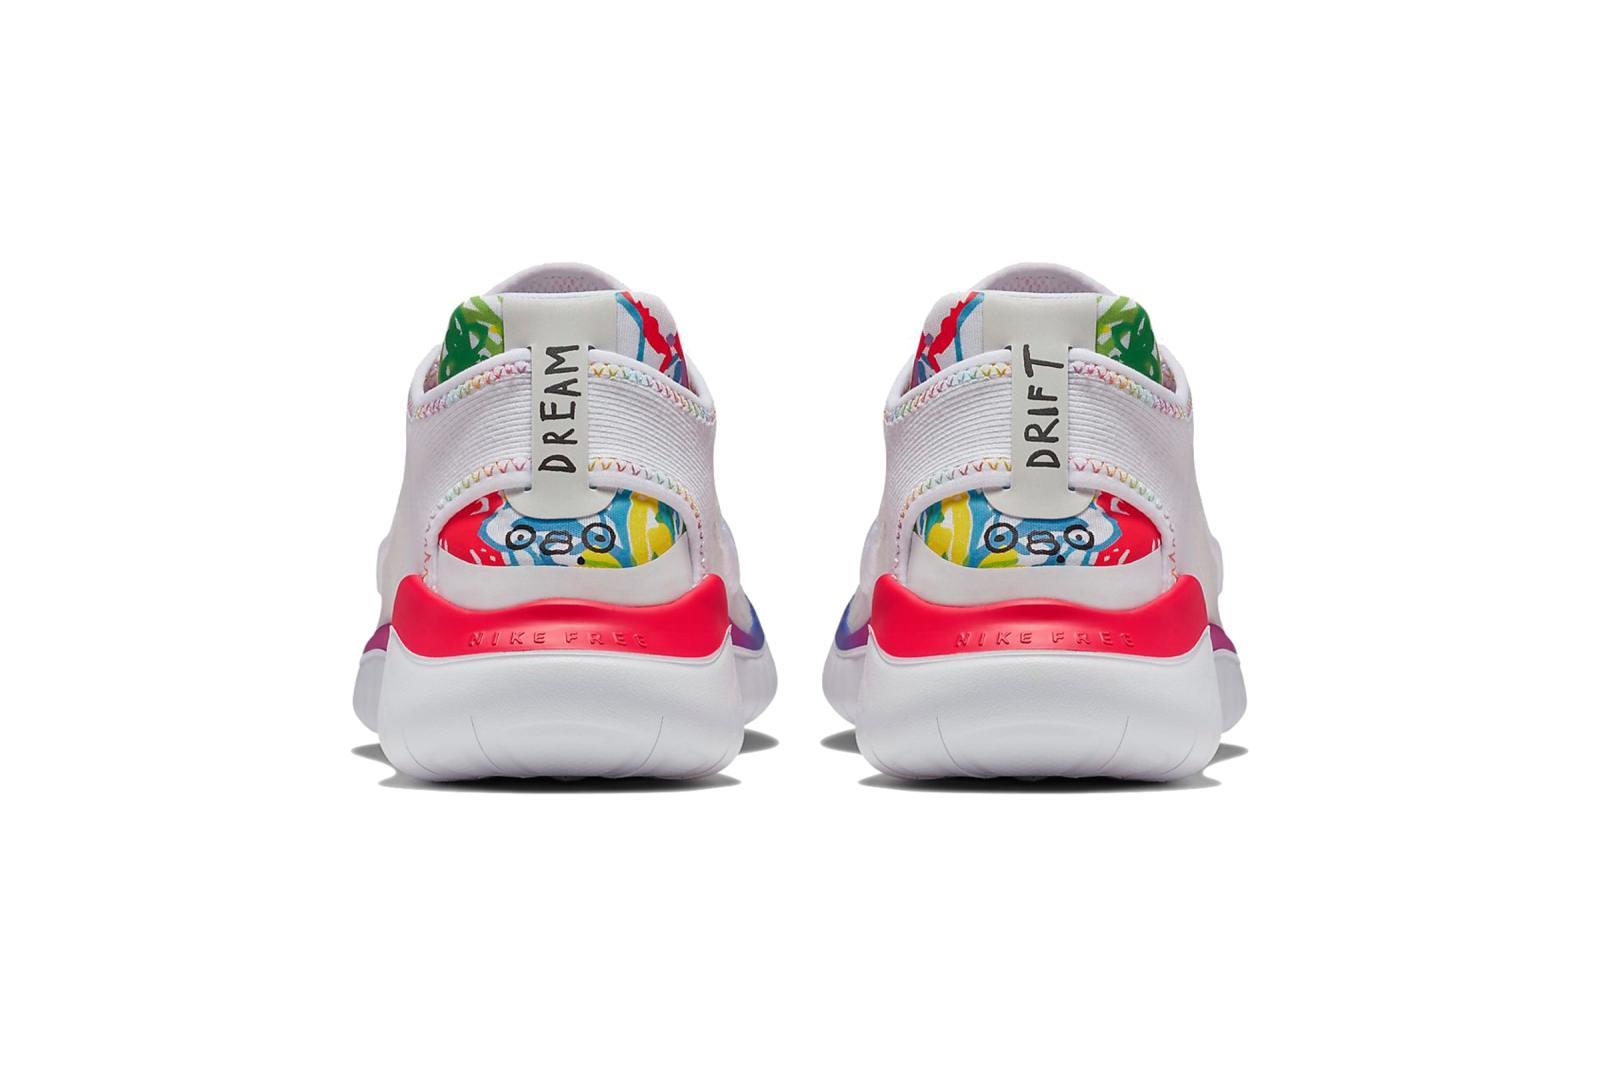 FLABJACKS x Nike Free RN「Free Expression」聯名系列登場